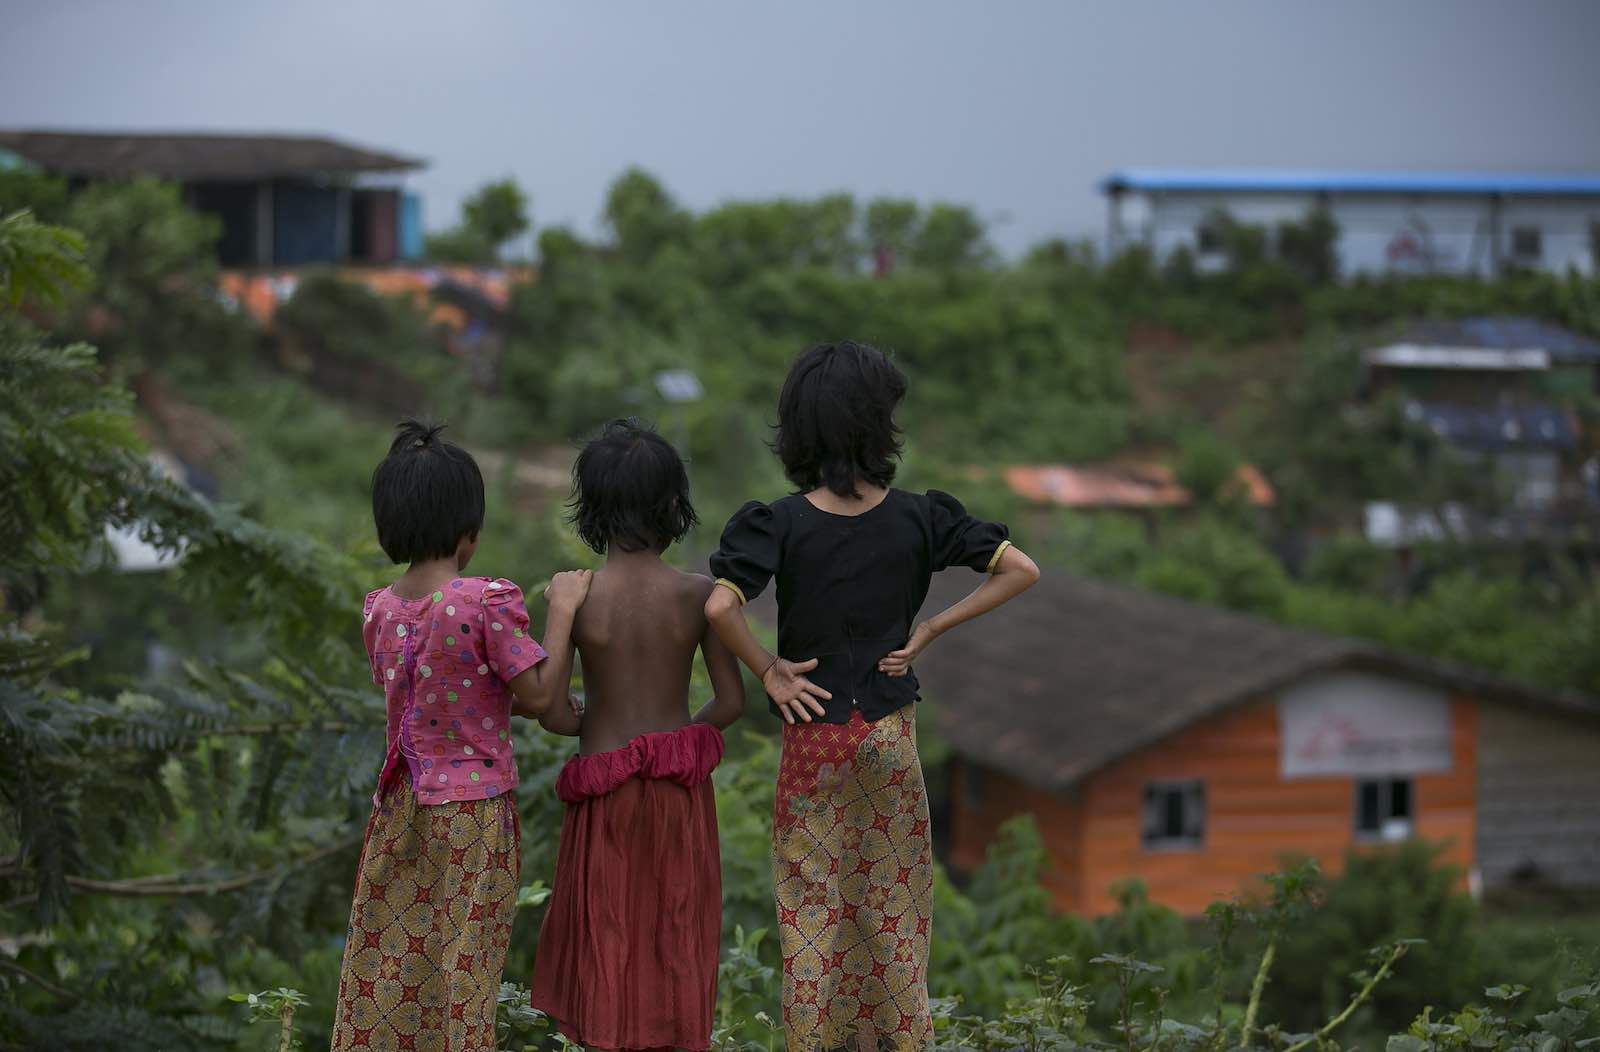 Balukhali refugee camp in Cox's Bazar, Bangladesh (Allison Joyce/UN Women)